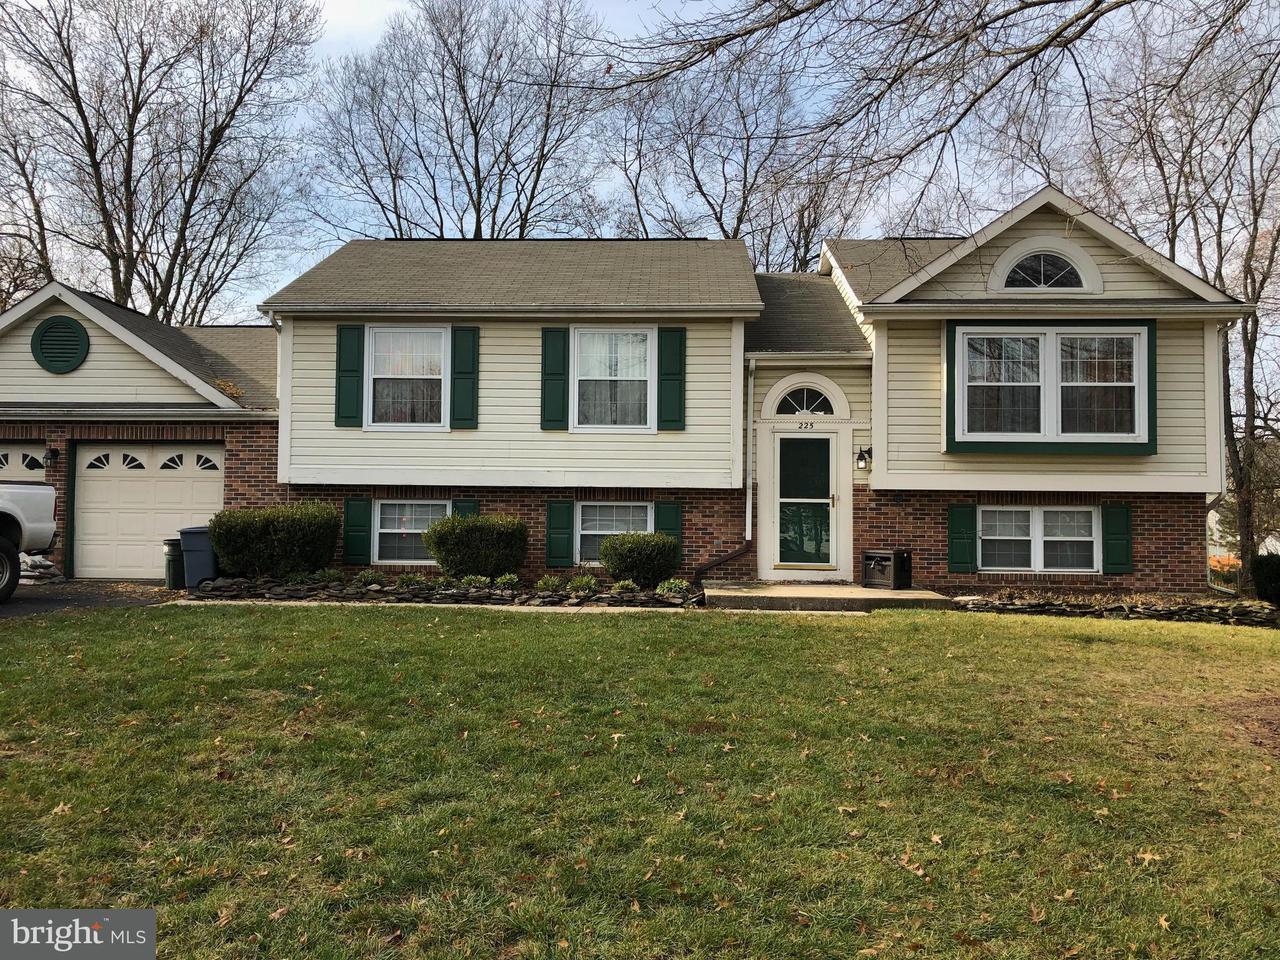 Other Residential for Rent at 225 Sandstone Dr Walkersville, Maryland 21793 United States